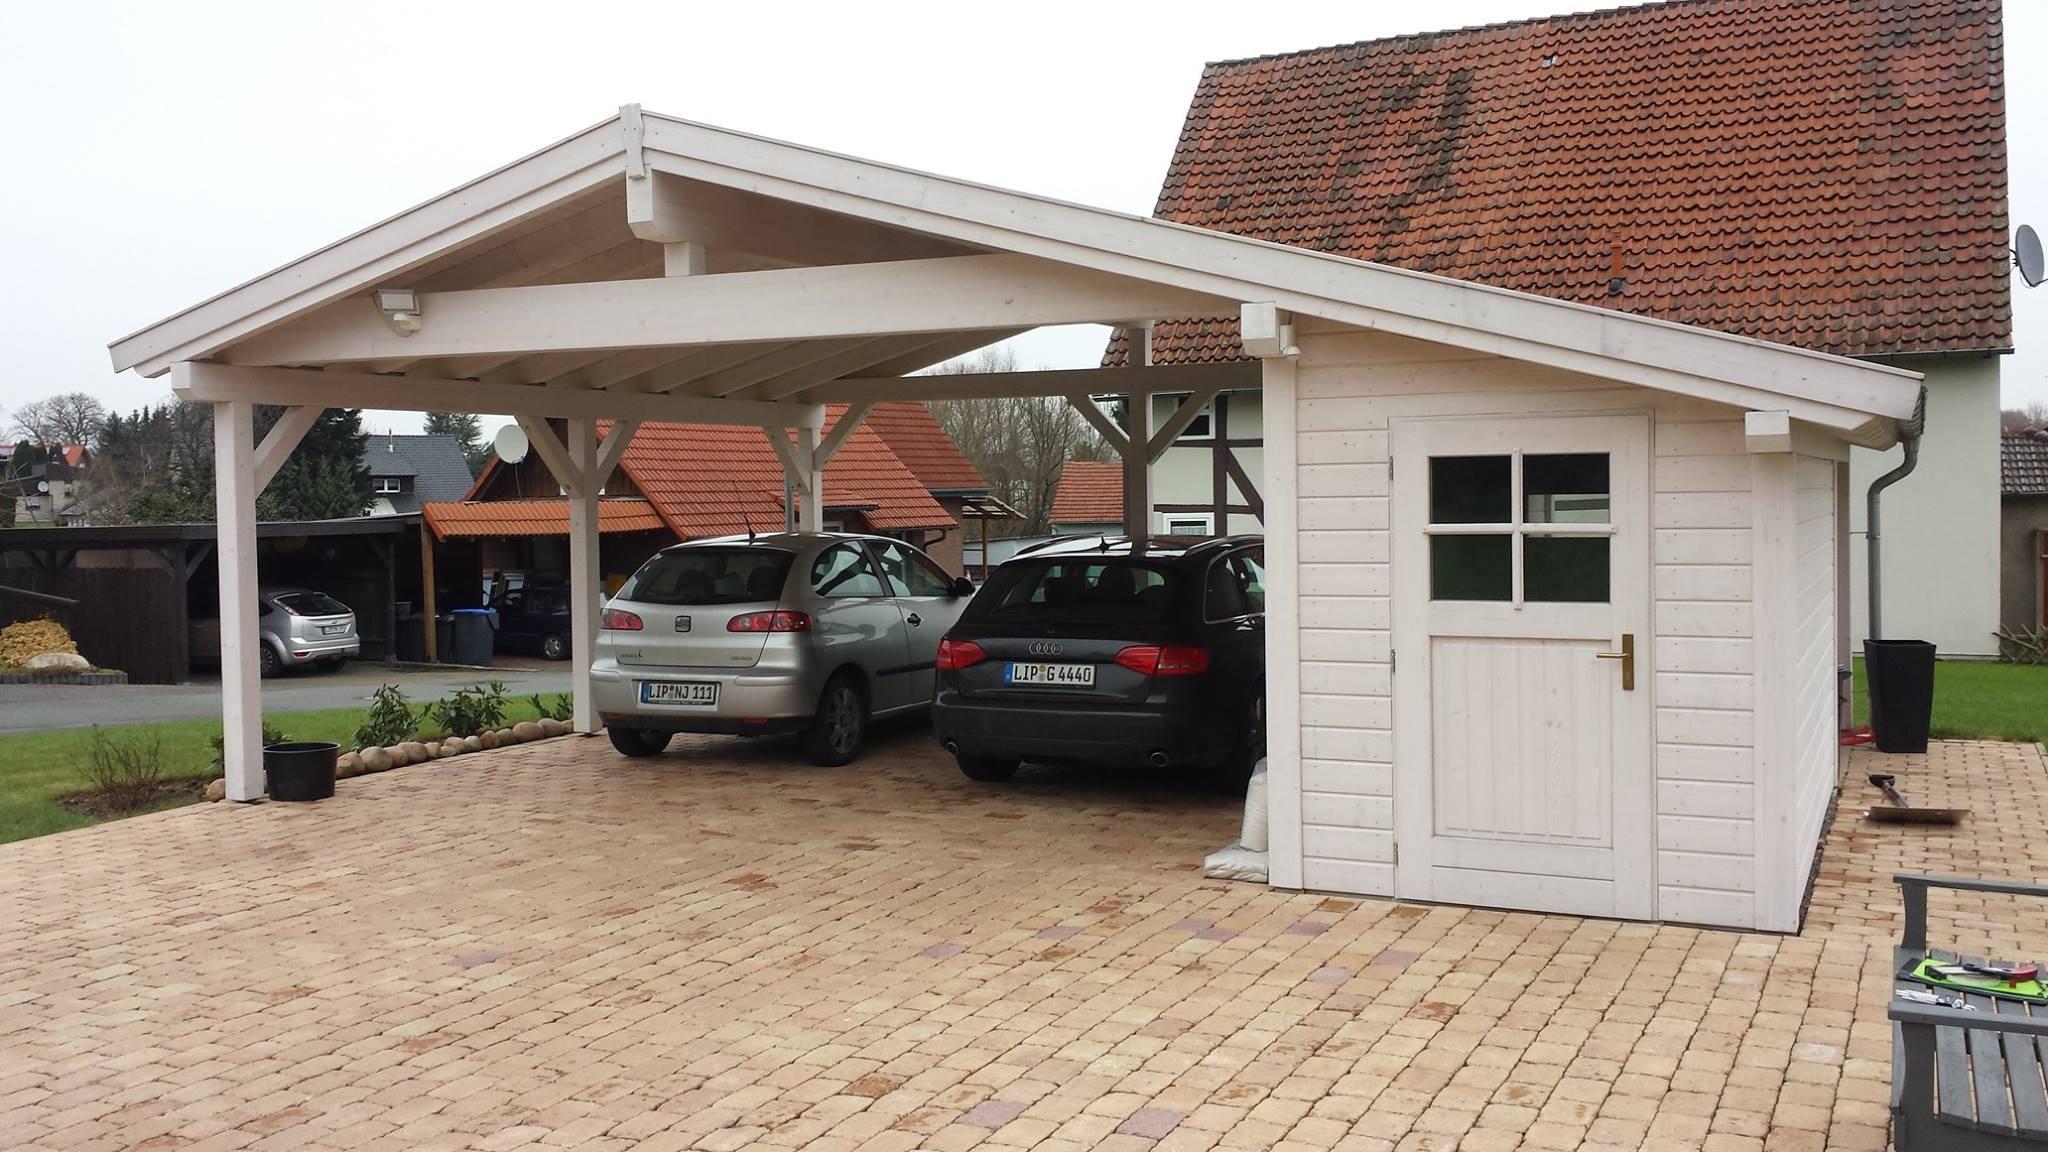 Doppel-Carport, Satteldach, Abstellraum